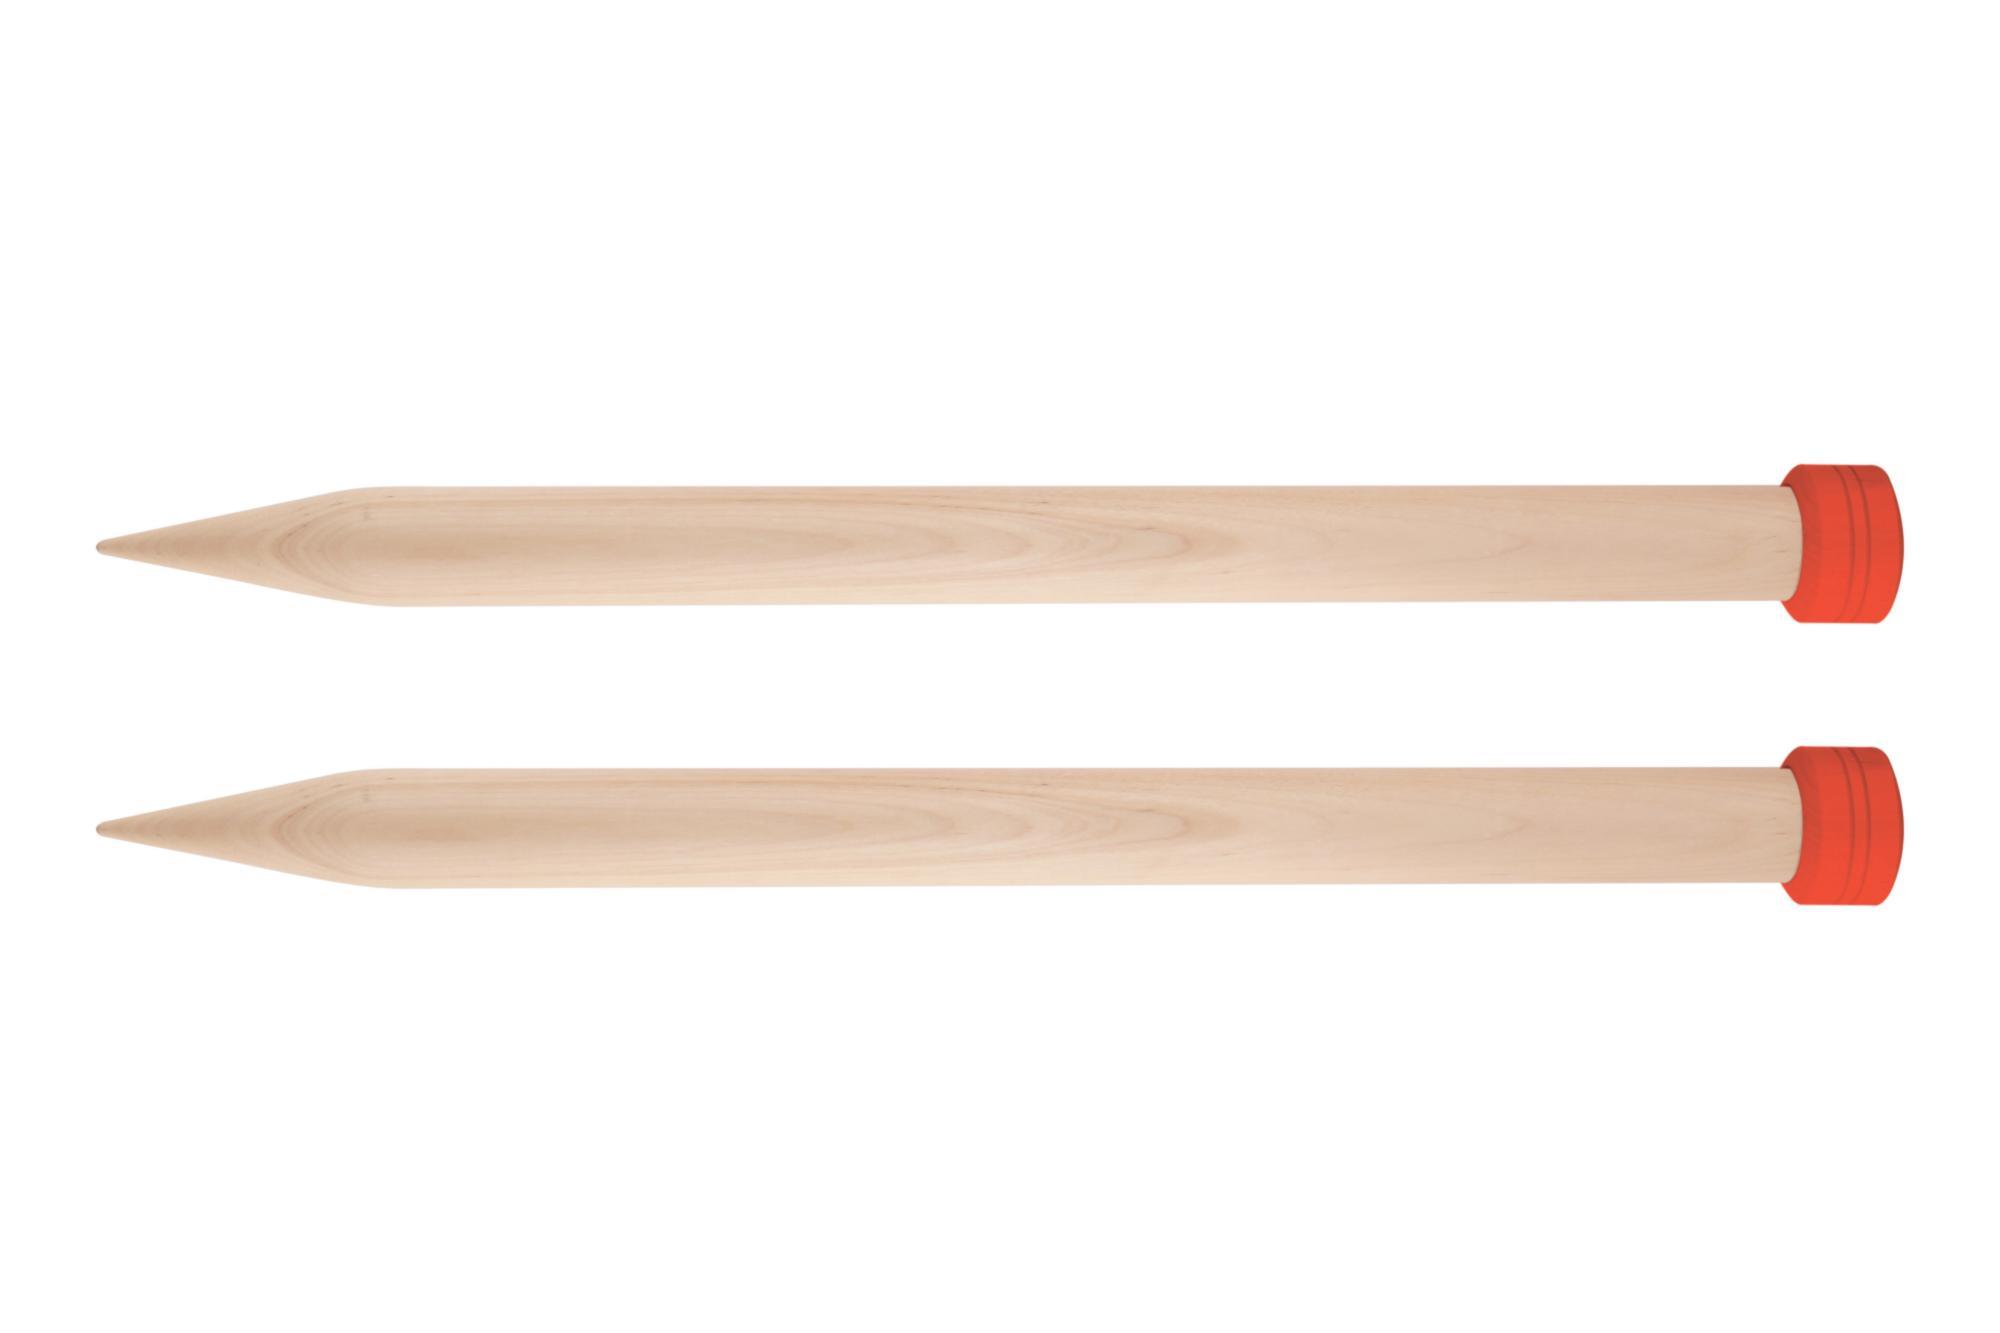 Спицы прямые 40 см Jumbo Birch KnitPro, 35293, 35.00 мм